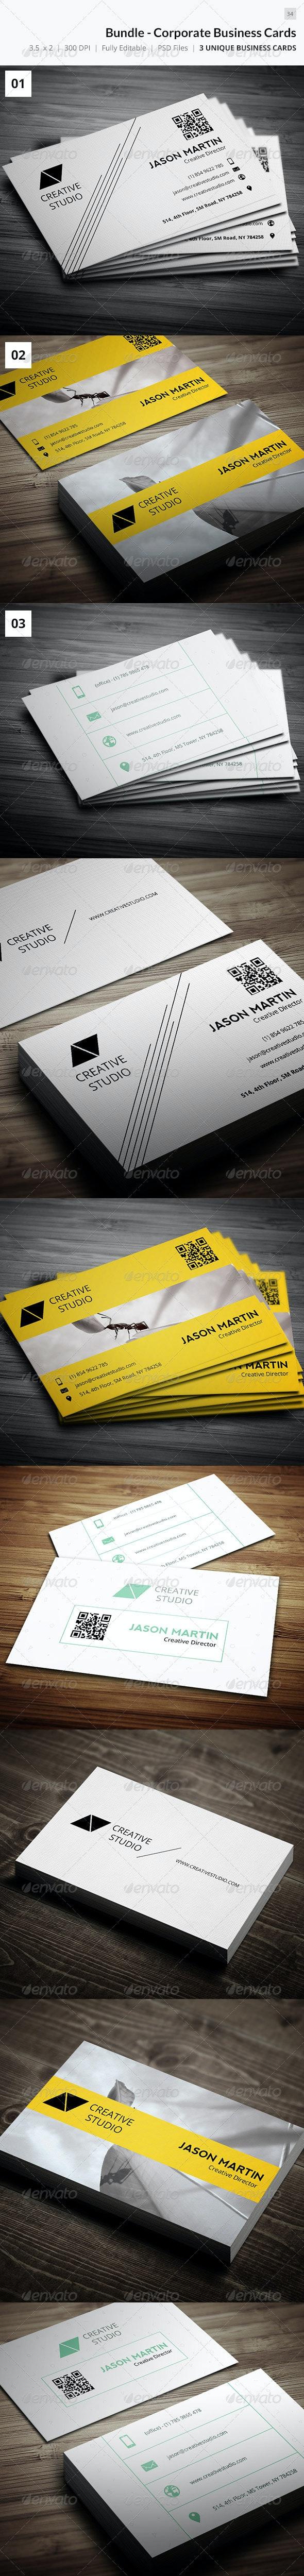 Bundle - Corporate Business Cards - 34 - Corporate Business Cards